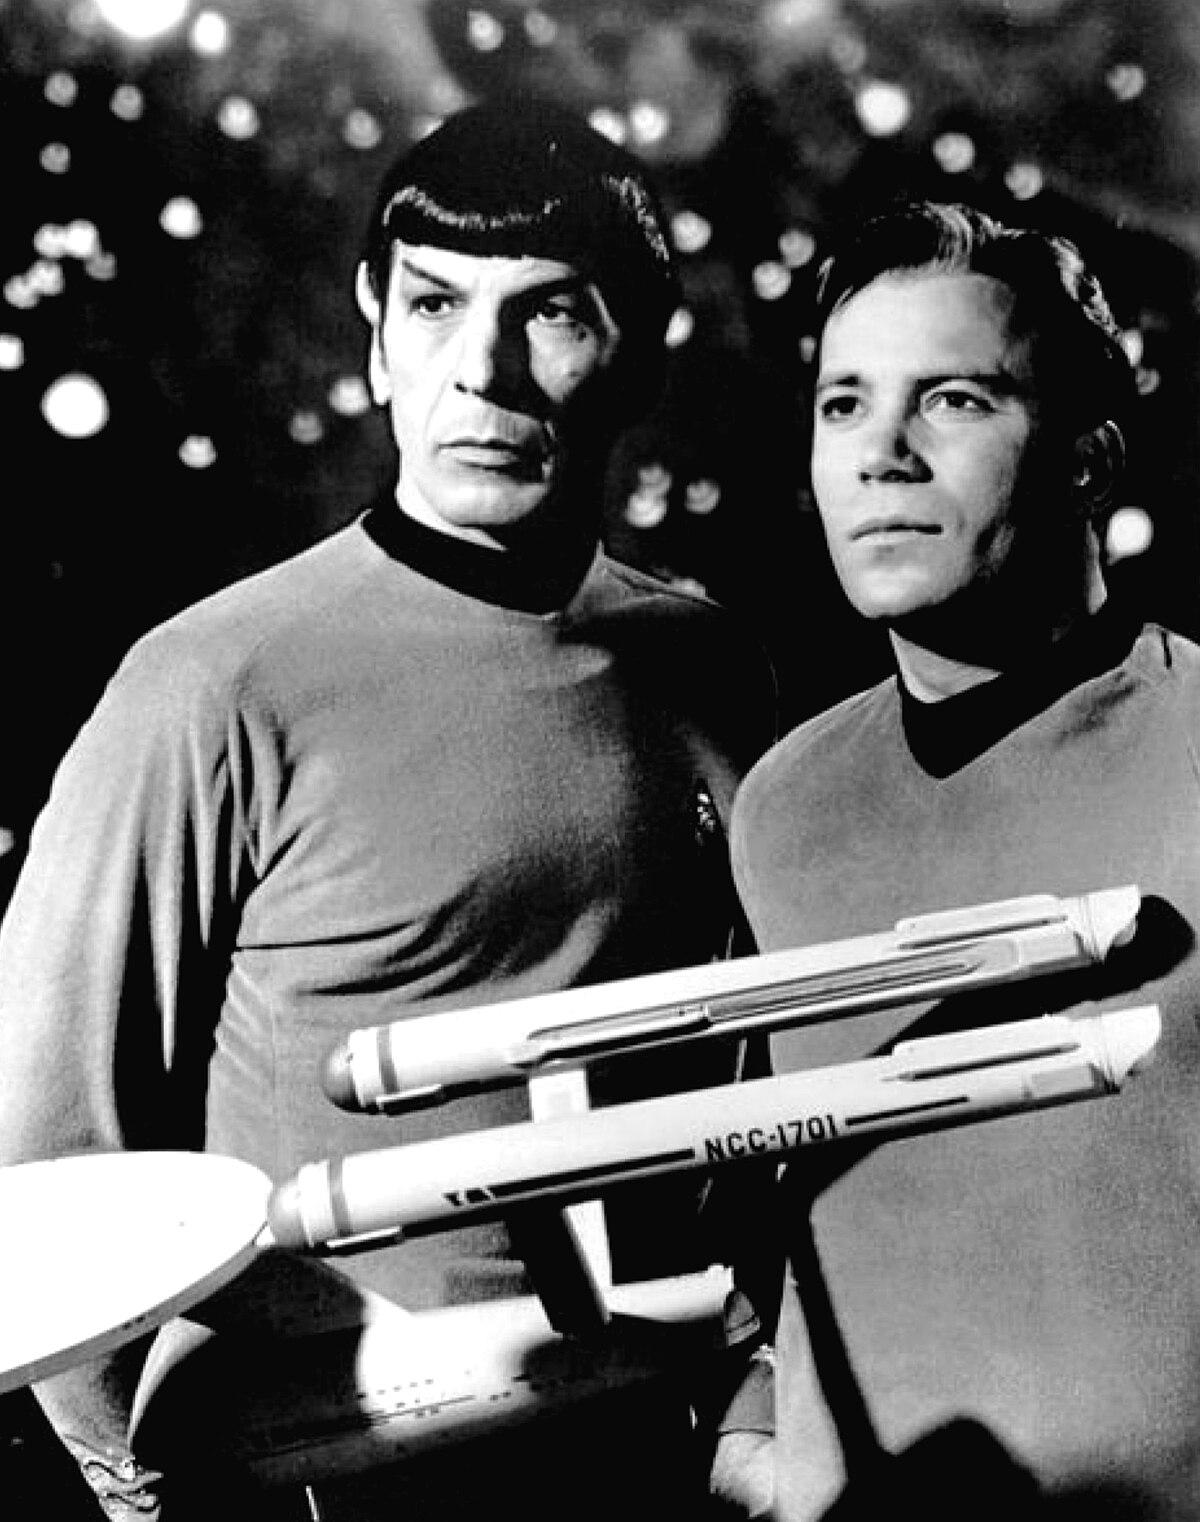 Leonard Nimoy William Shatner Star Trek 1968.JPG